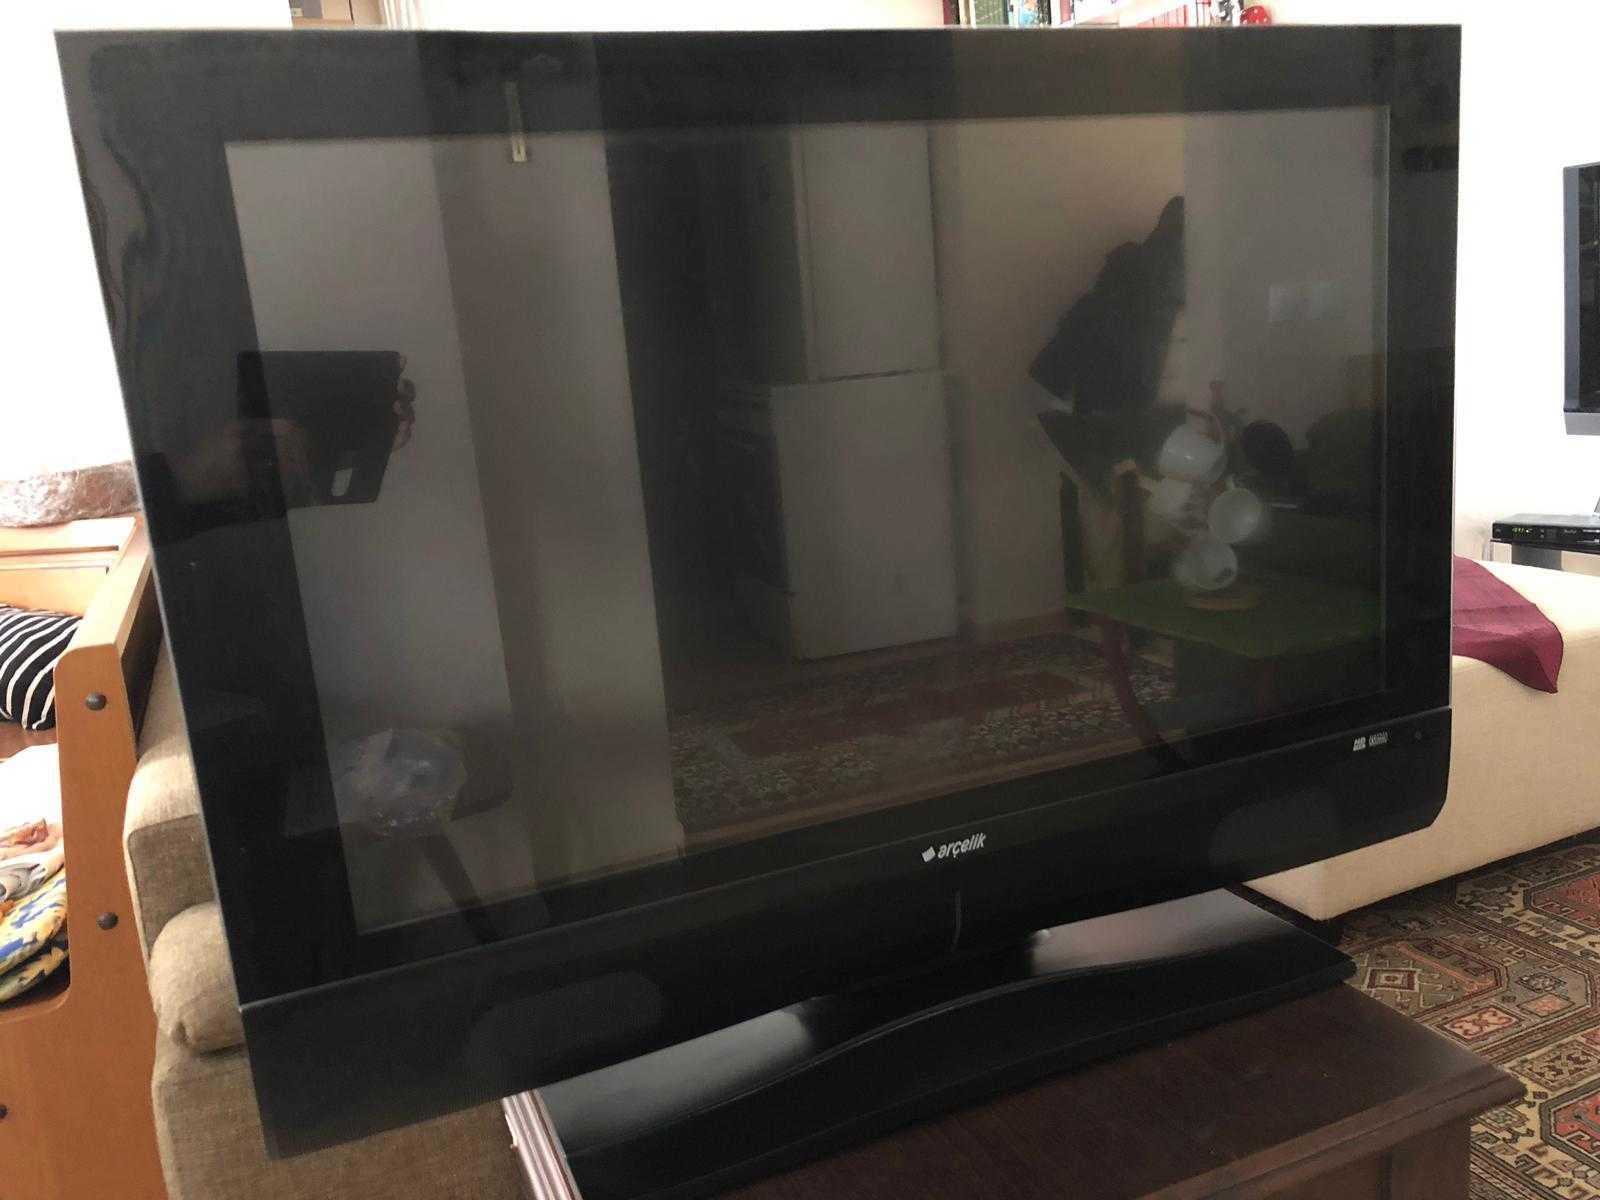 IMG 20190708 WA0042 optimized - Adnan Kahveci 2. İkinci El Televizyon Alan Yerler